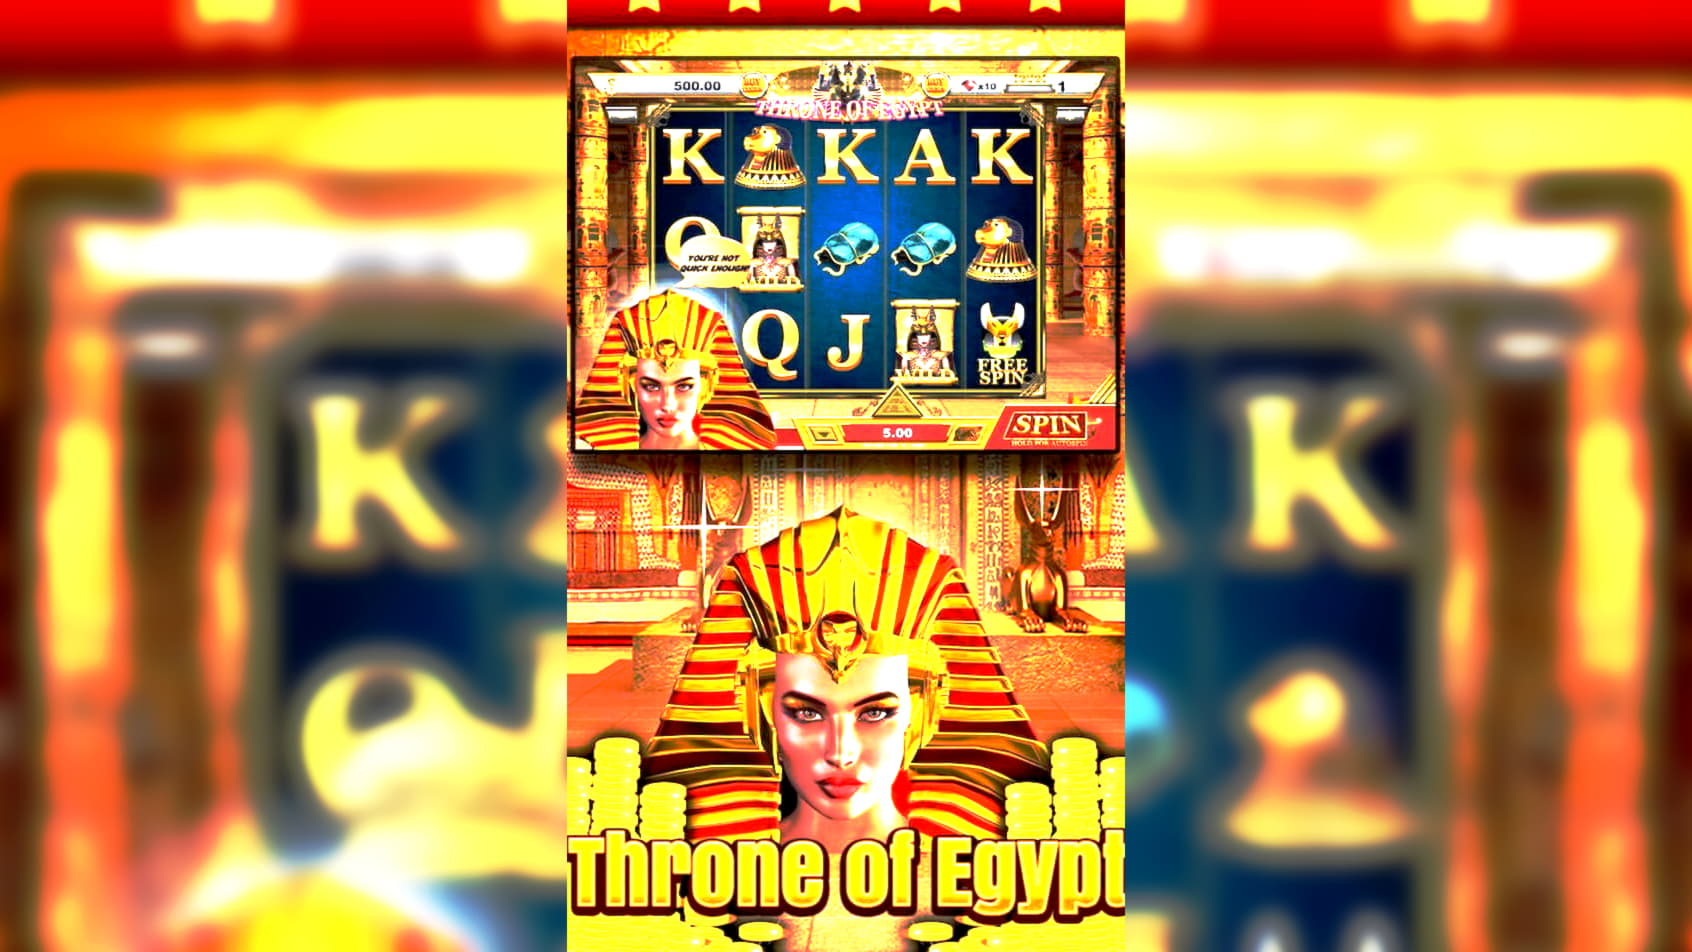 Poker betting online Jackpot Knights Spielzeug